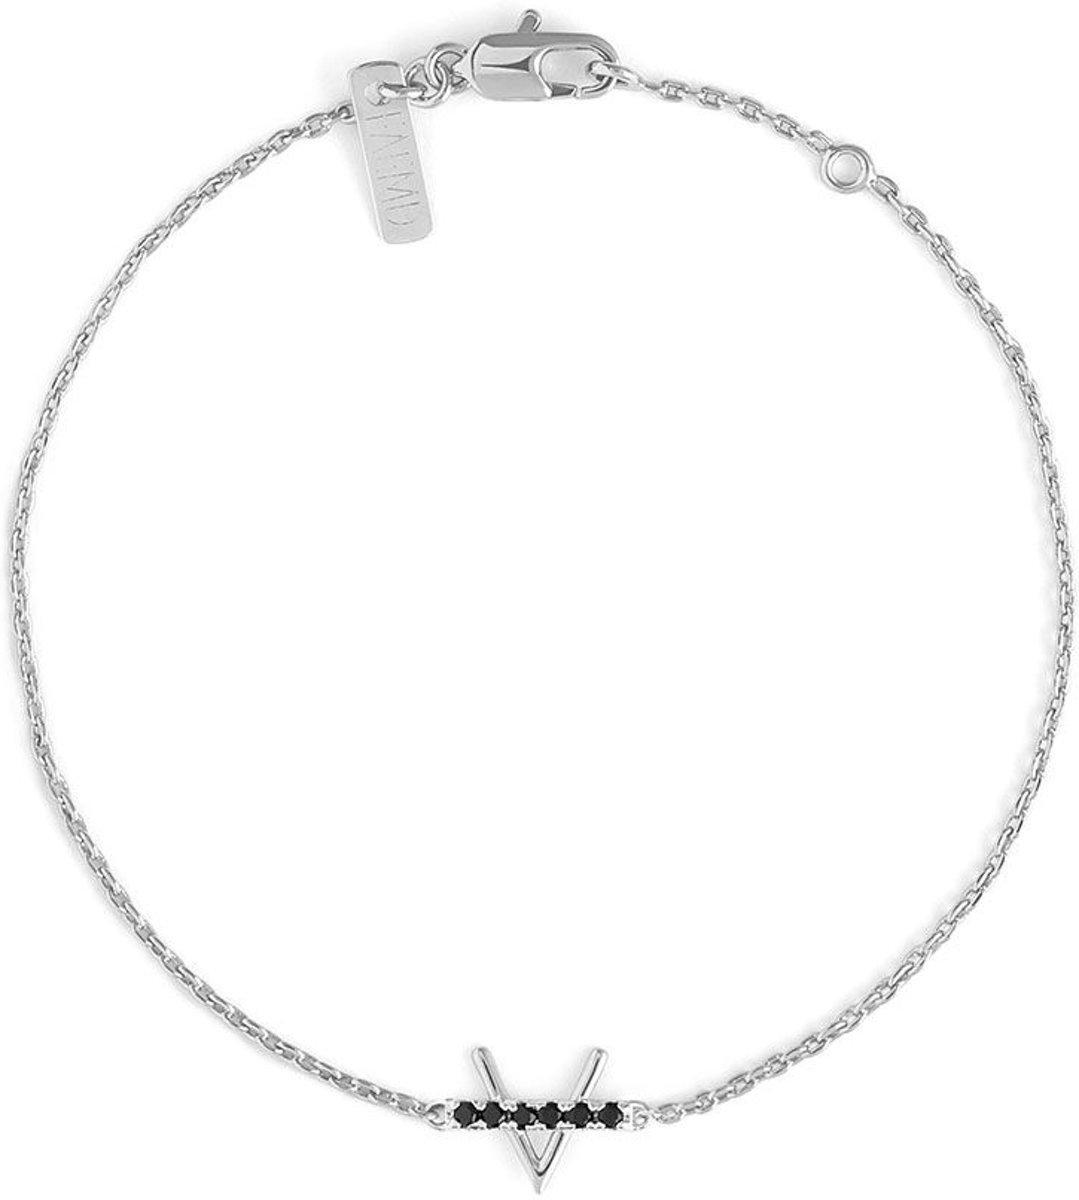 FAEMD V & Black Studs Bar Bracelet - Dames - Armband - Zilver - Minimalistisch